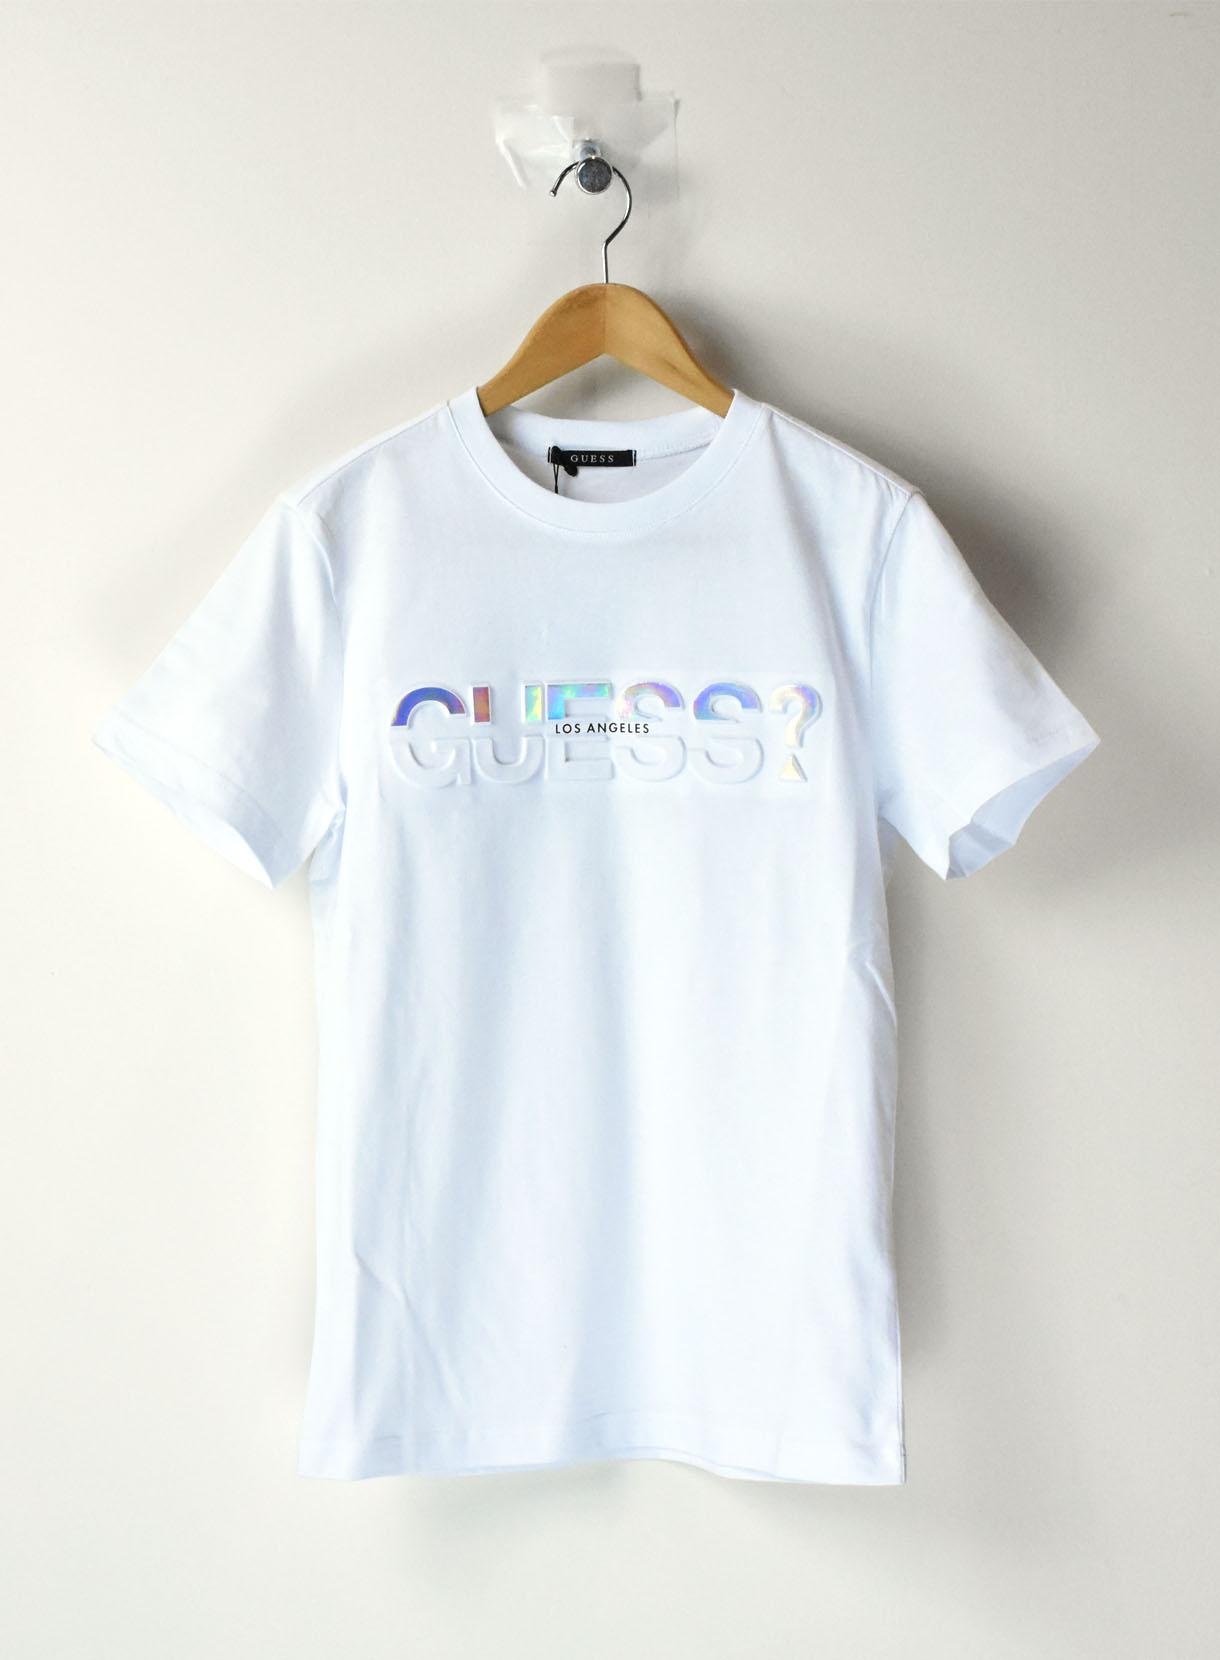 【GUESS】半袖Tシャツエンボス ホログラムロゴ 男女兼用